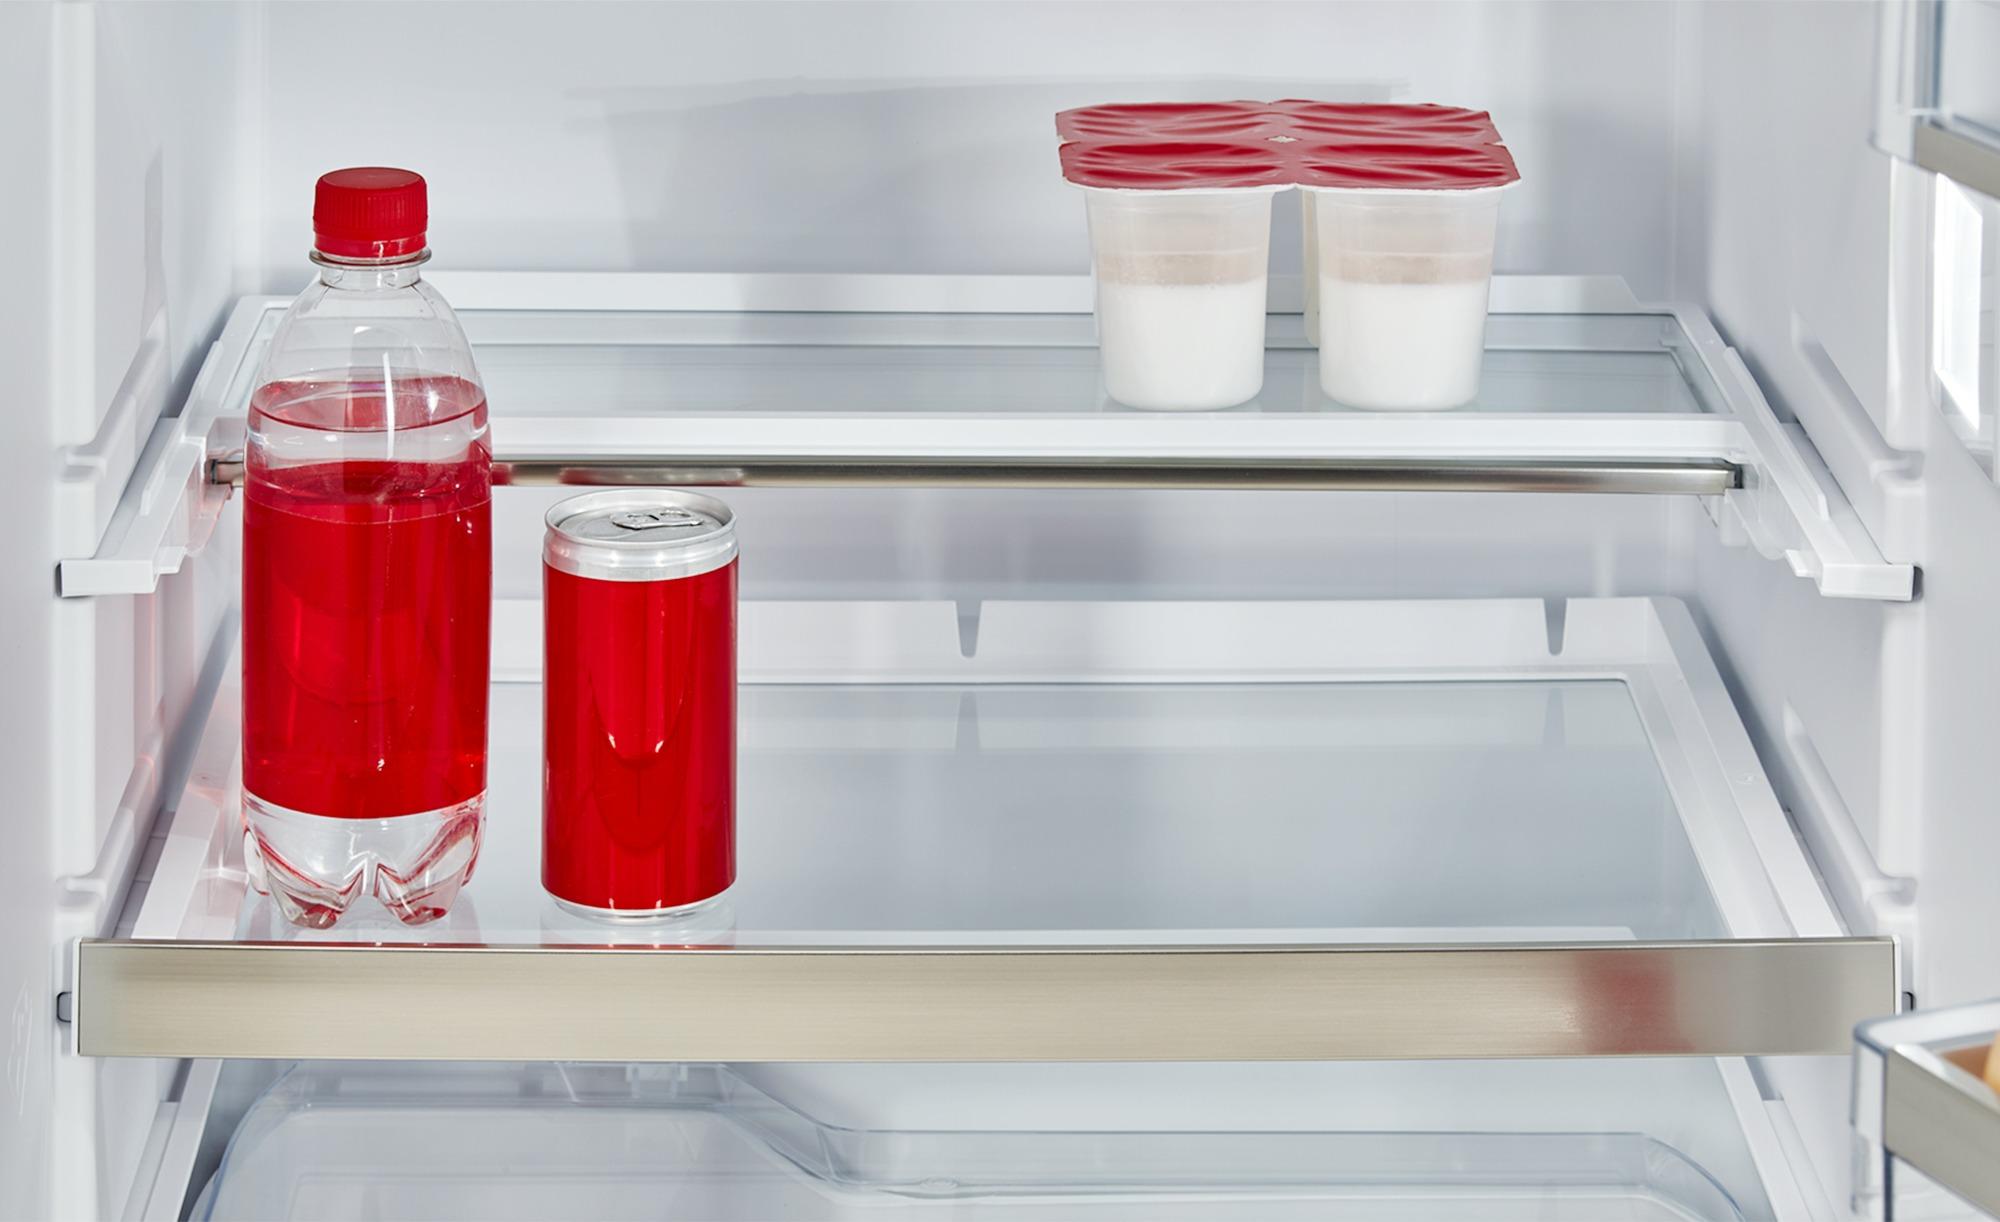 Siemens Kühlschrank Hydrofresh Box : Siemens einbau kühlschrank ki rad möbel höffner